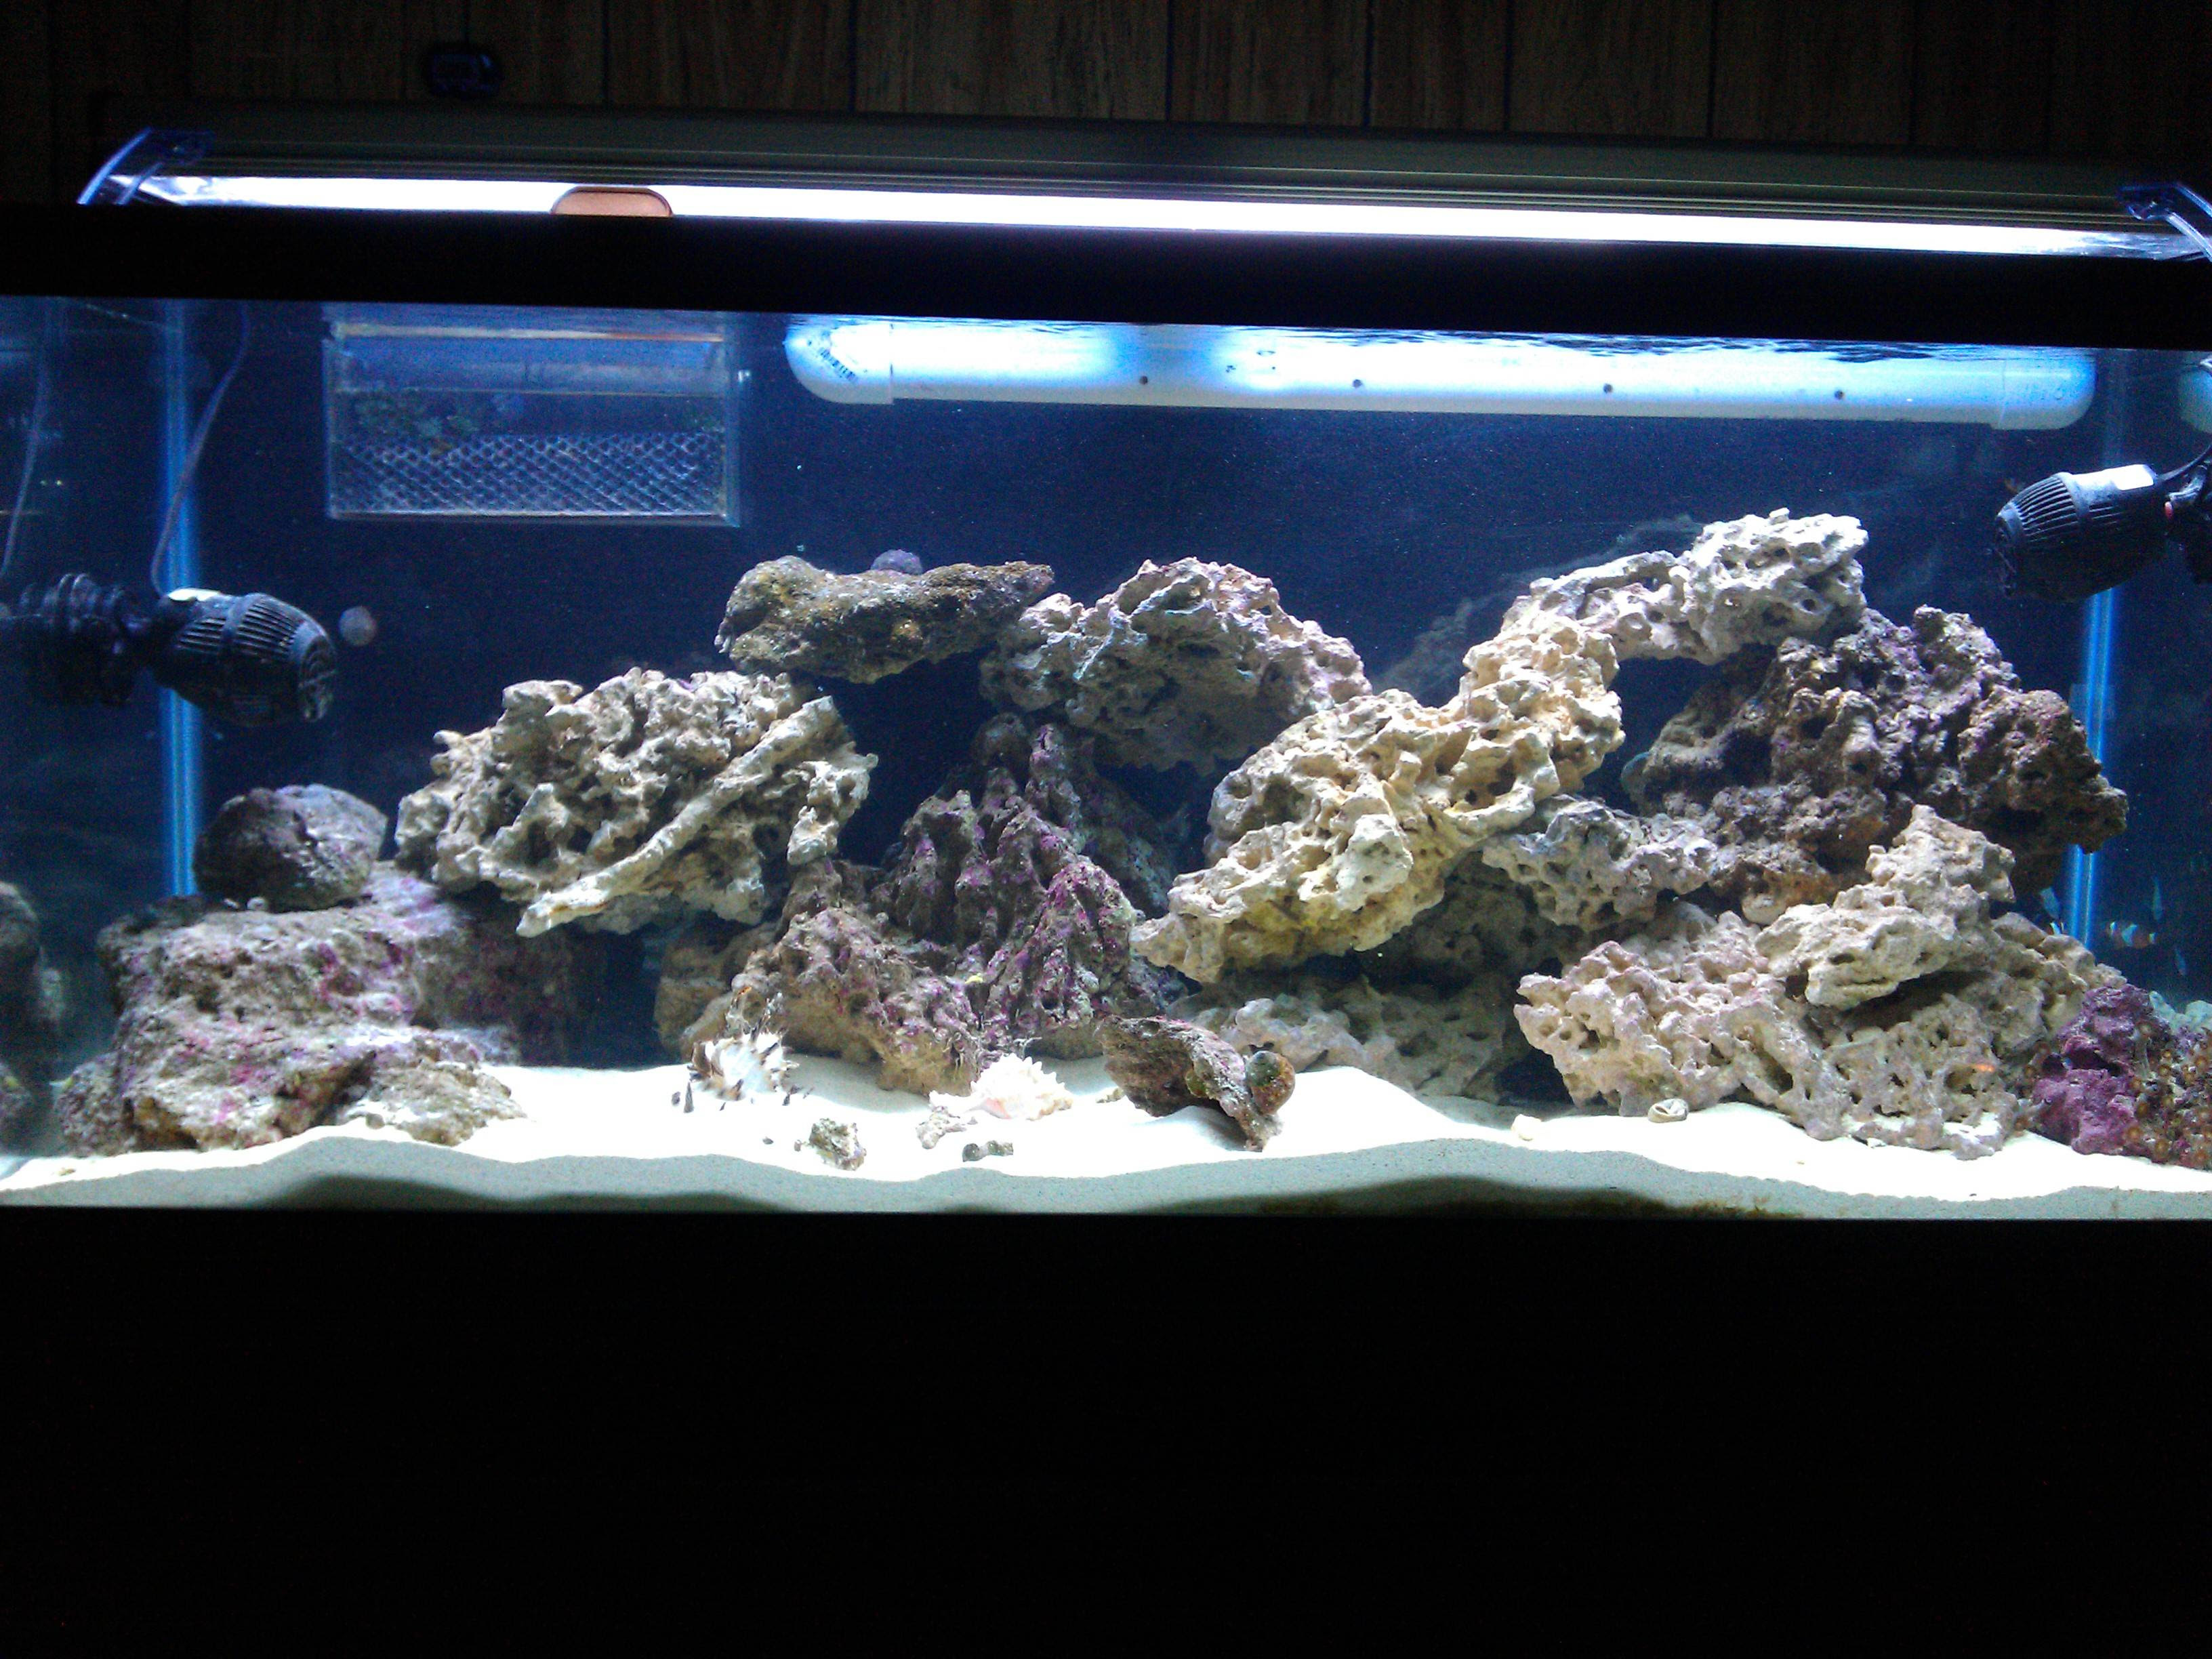 Aquascaping Reef Tank Ideas - Aquascape Ideas